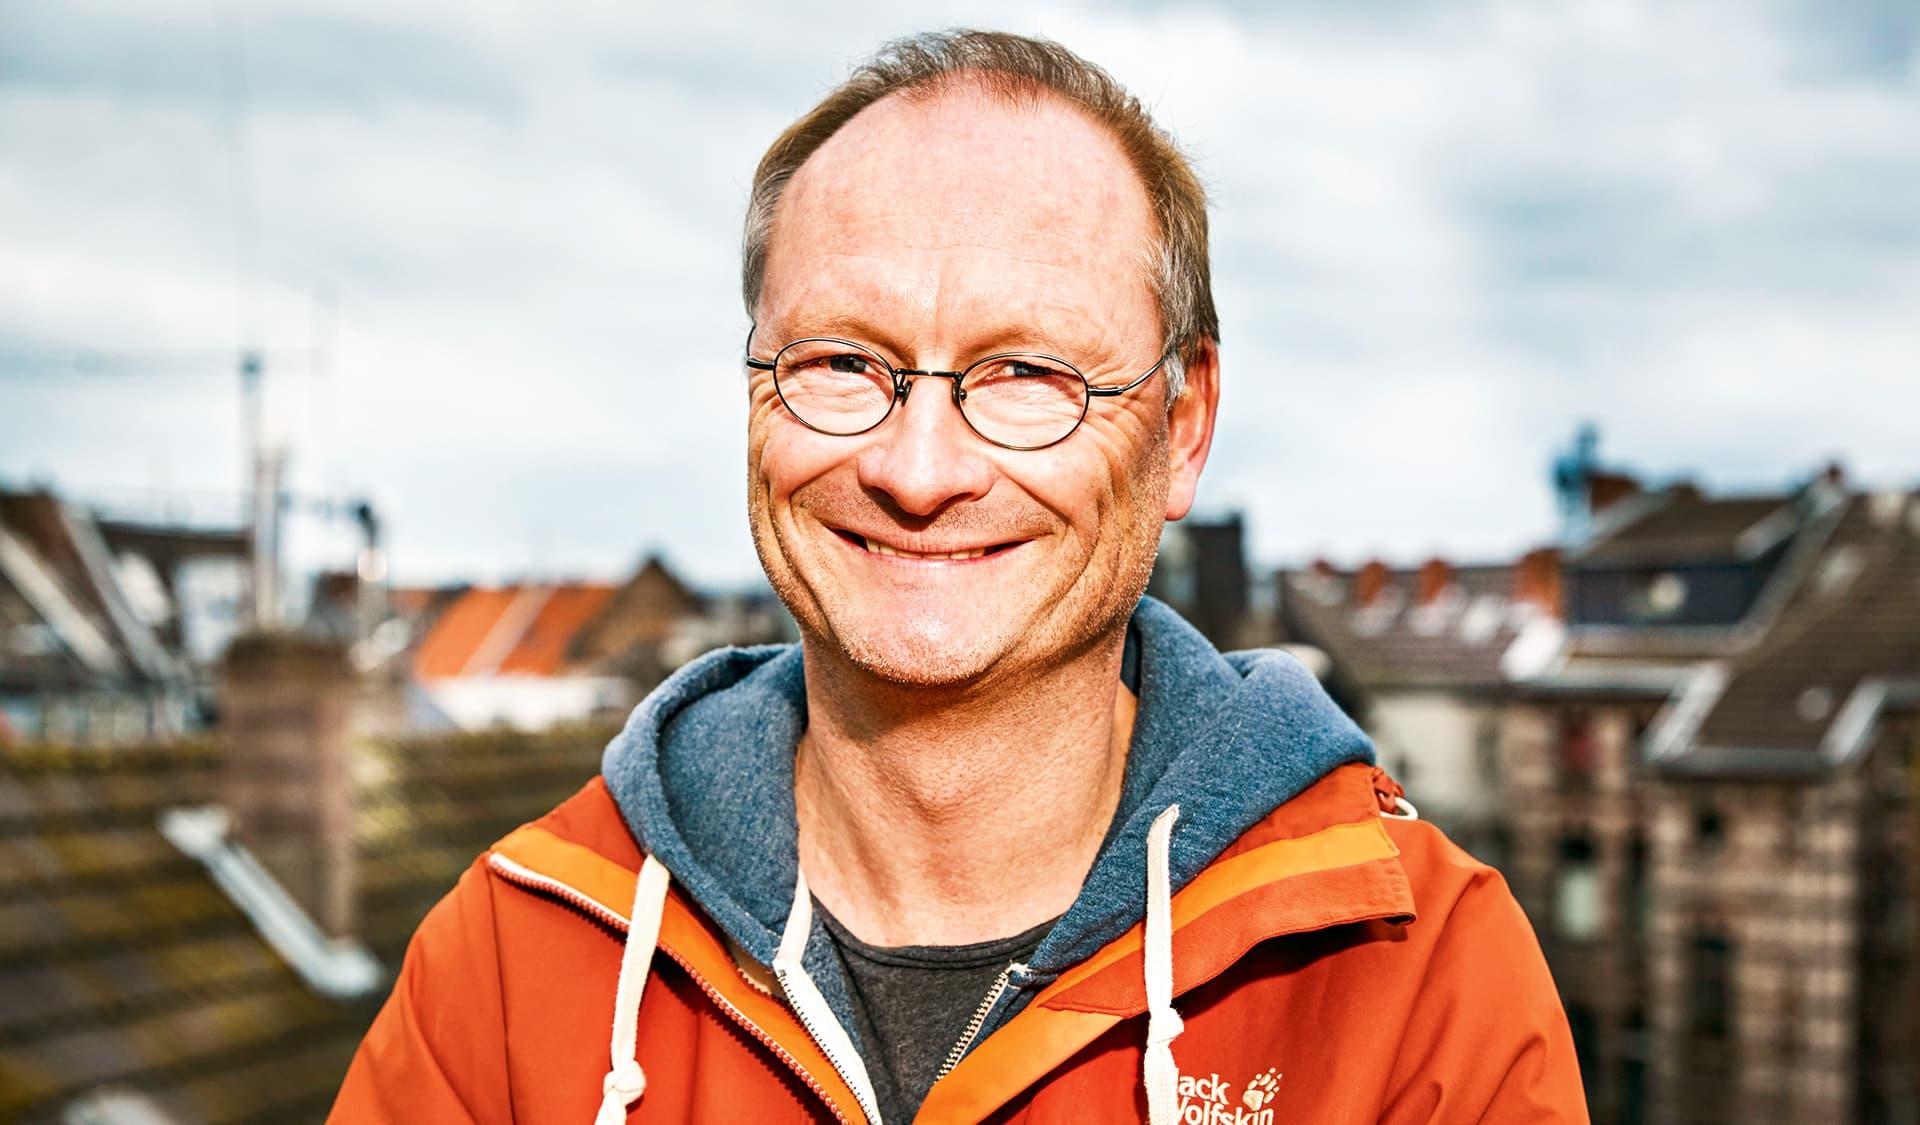 Sven Plöger in orangener Jacke